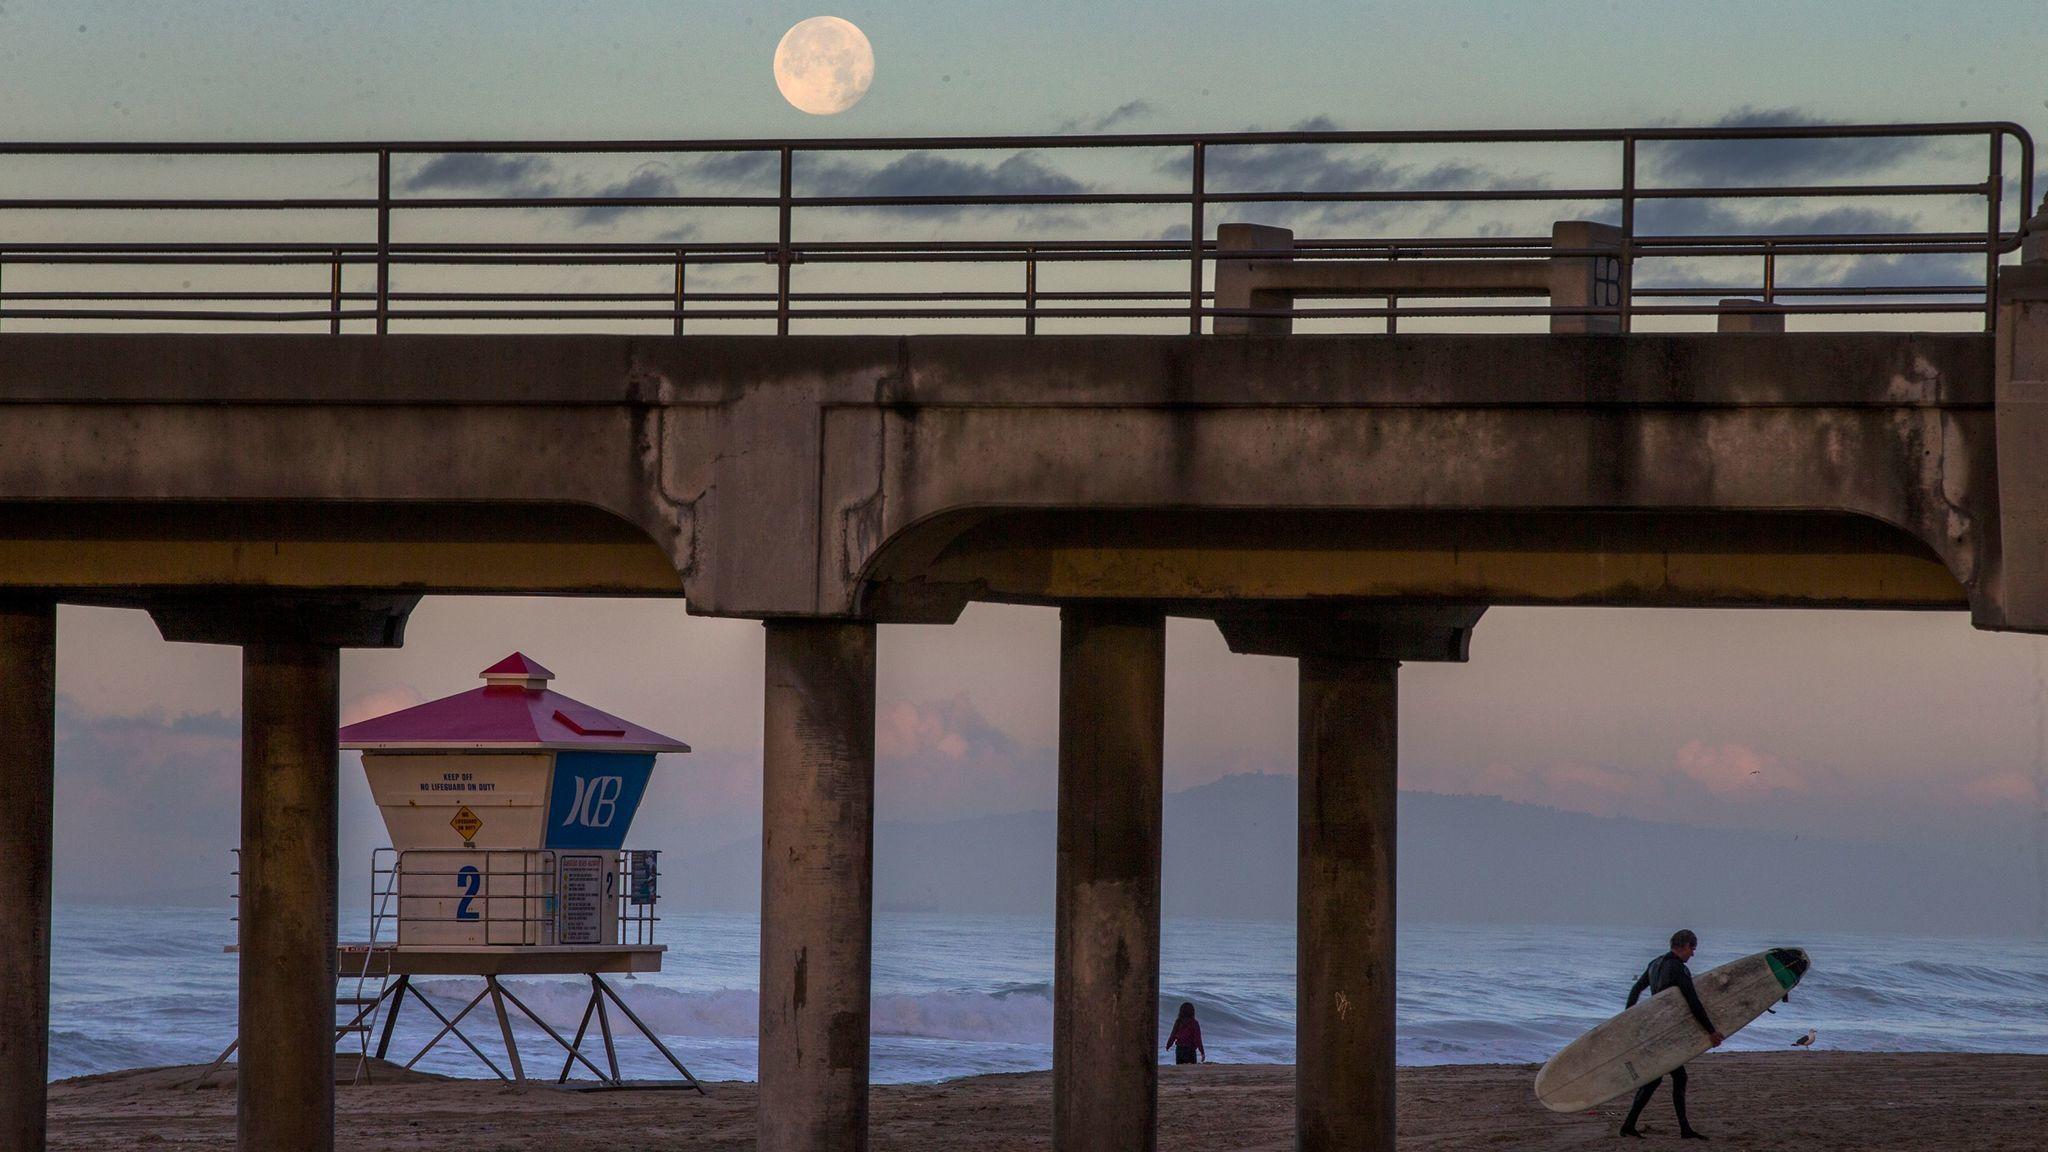 City Of Huntington Beach Planning Commission